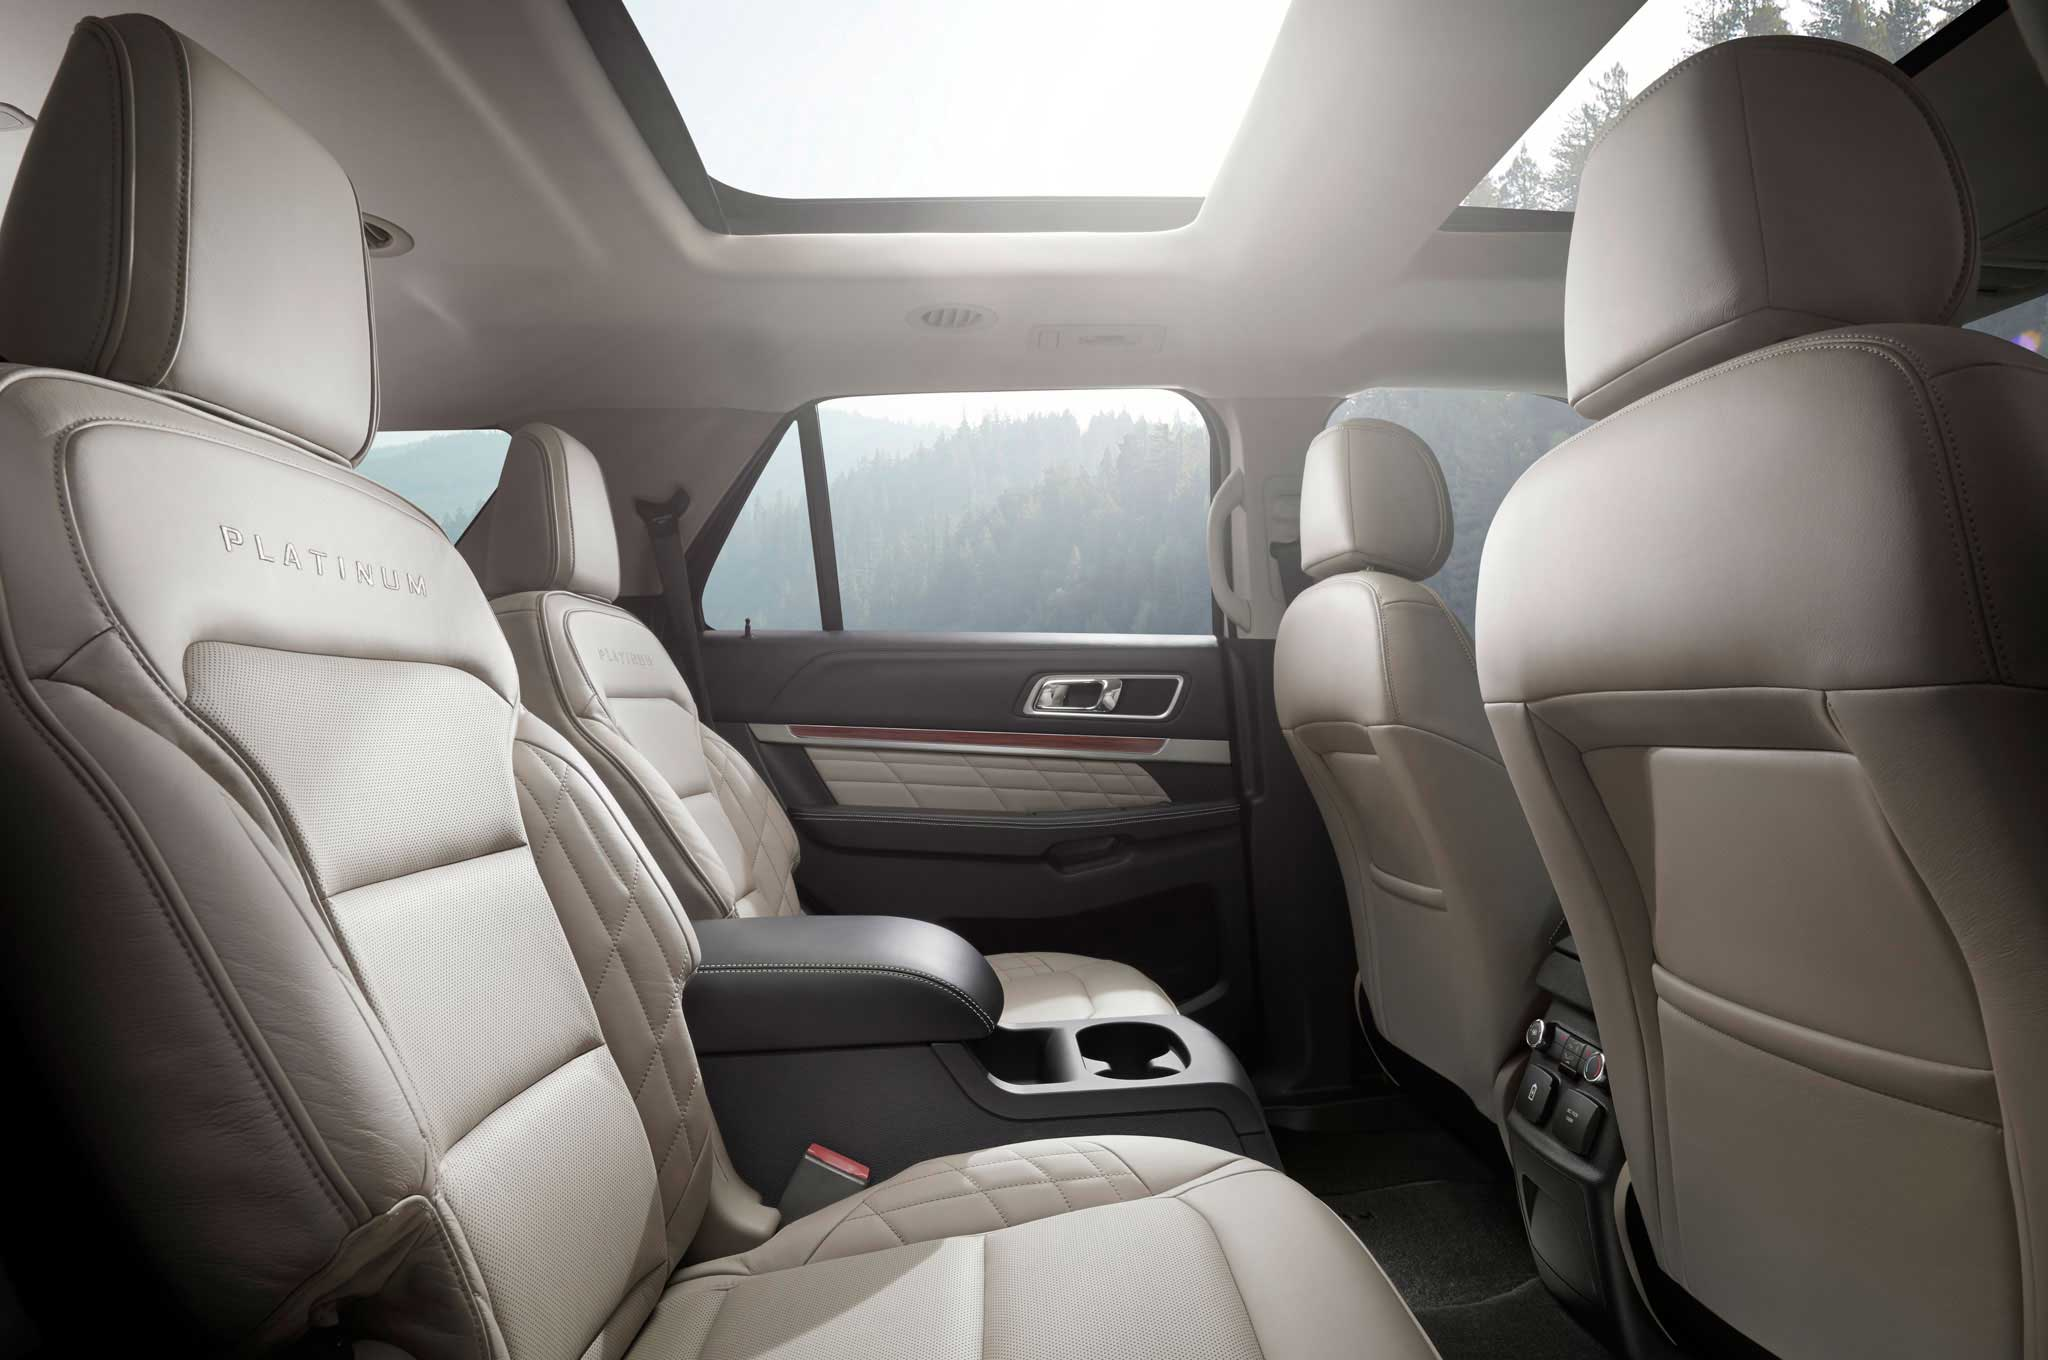 2016-ford-explorer-back-seats